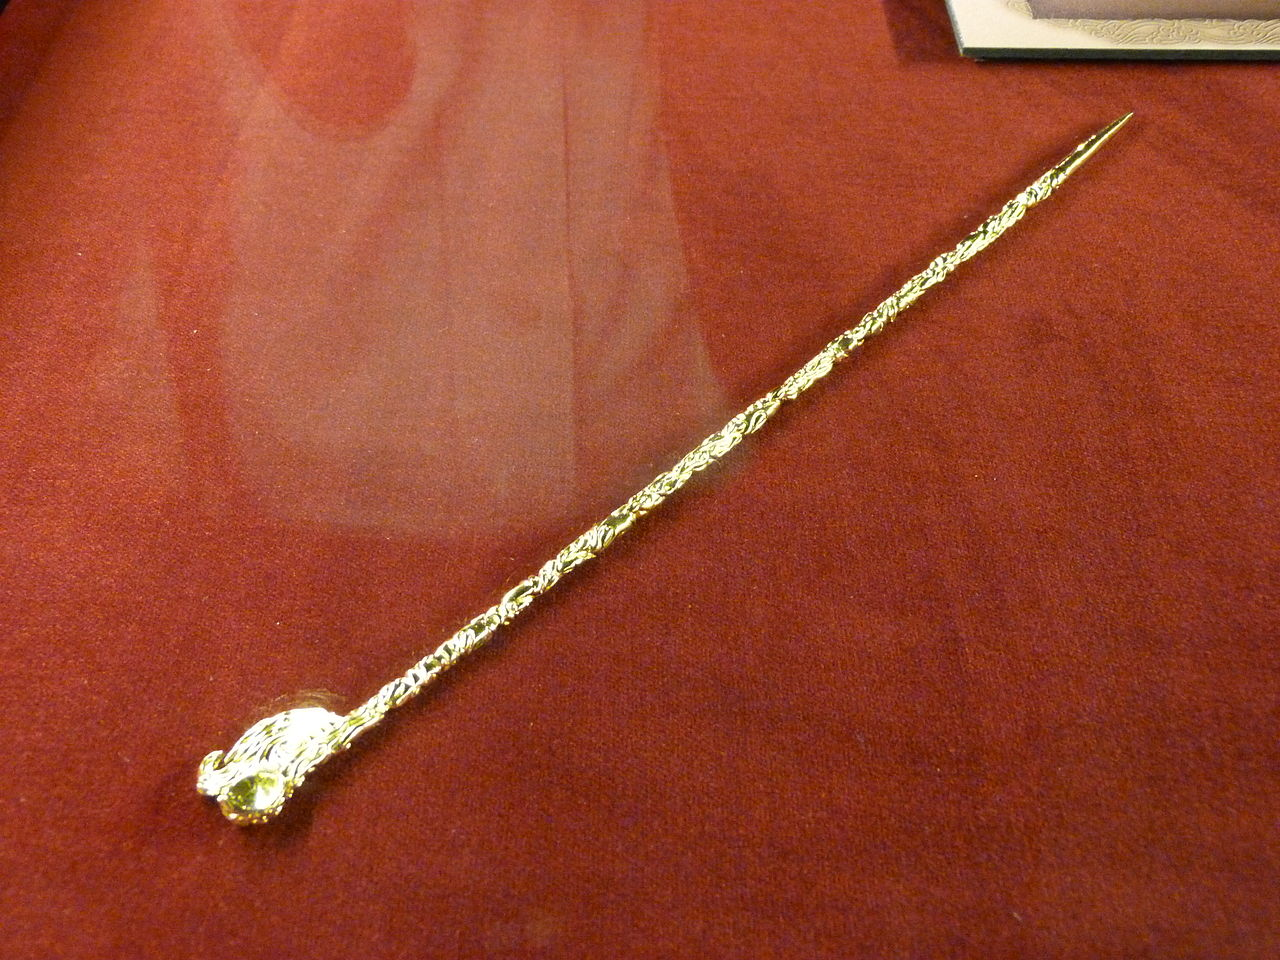 1280px-7._Hairpin_with_spoon-like_top_burial_mound_Arzlan_(VIII.-VII._B.C.)_Tuva.JPG